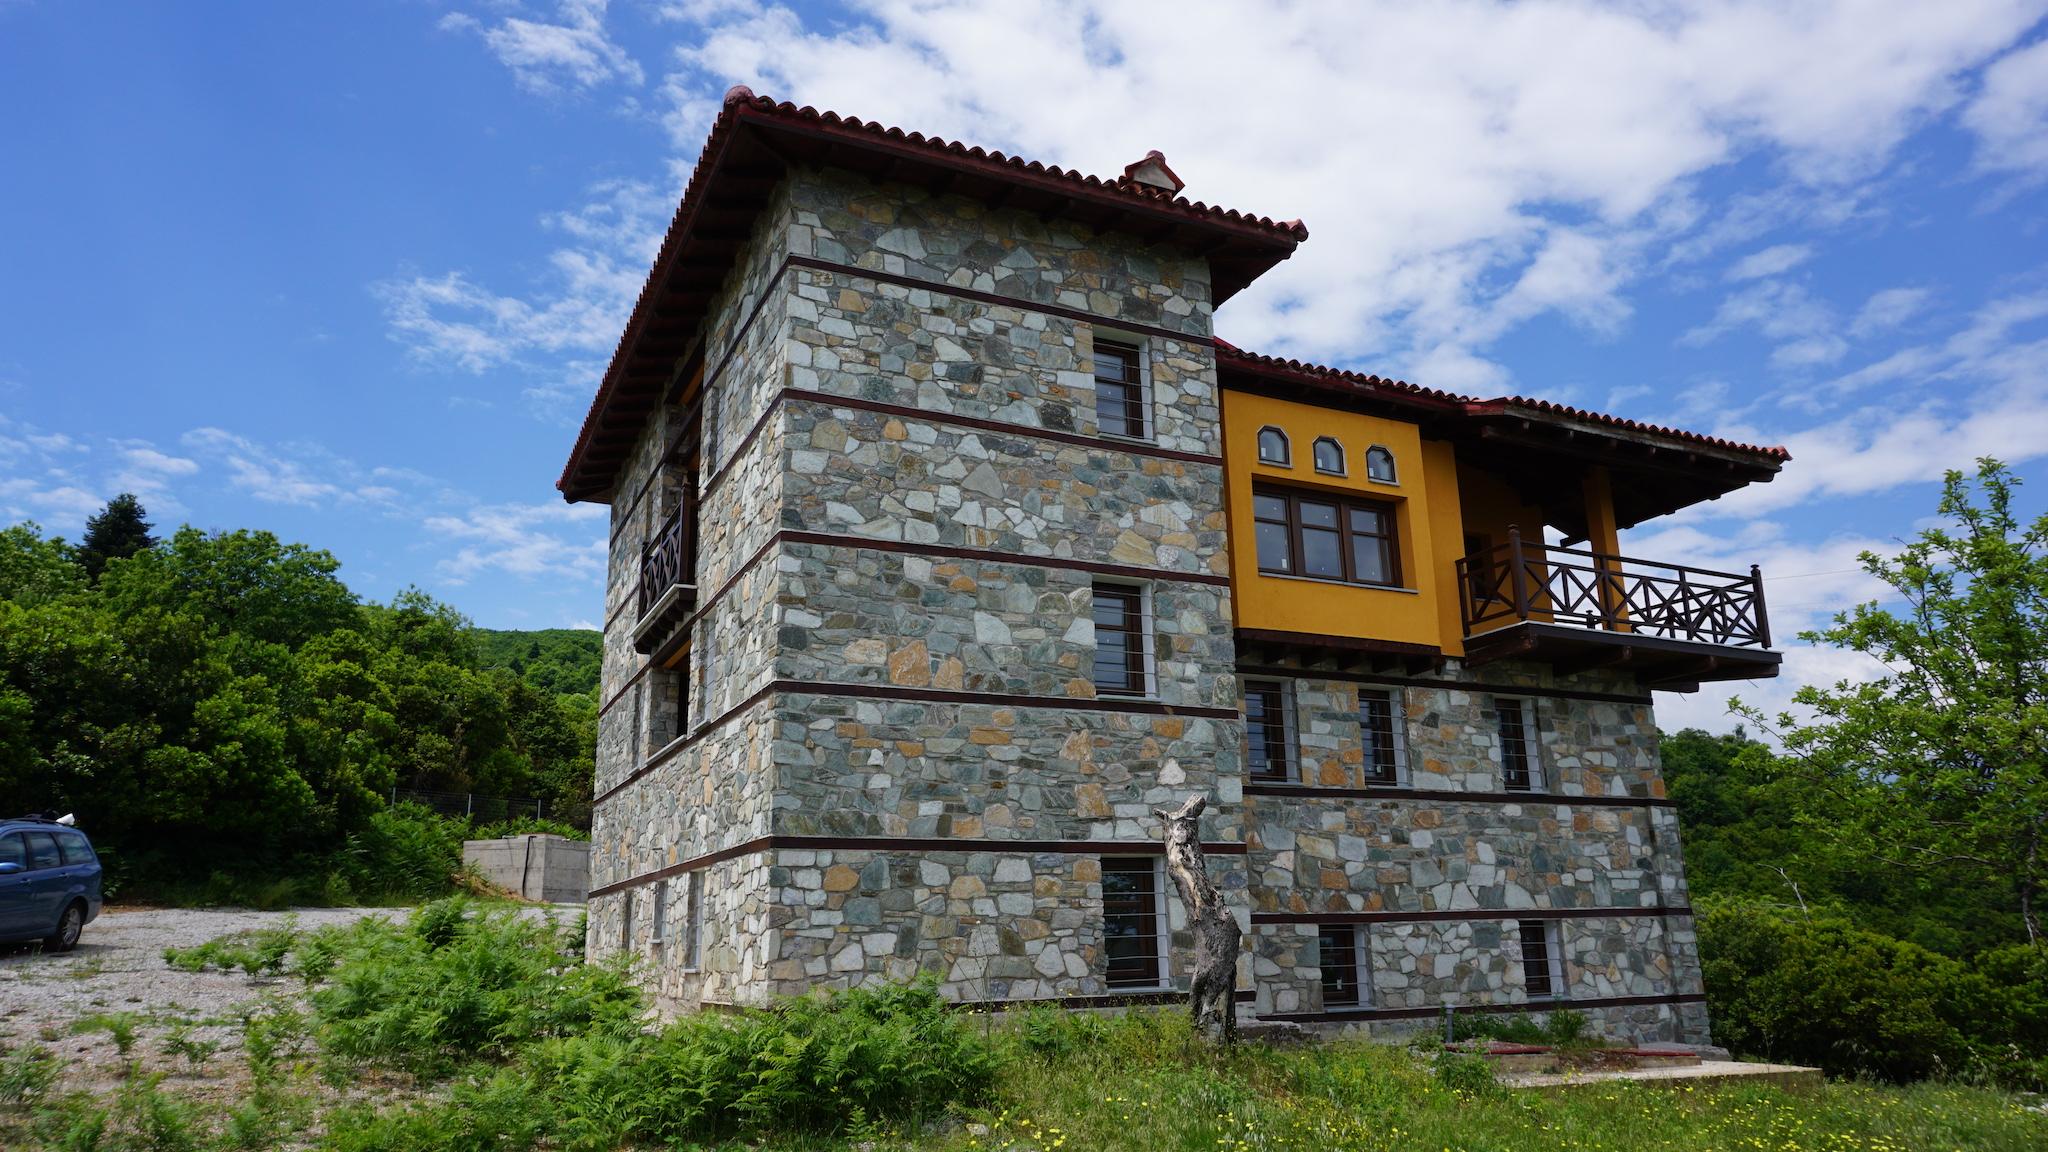 The Diamond Way Budddhist Retreat Center Olymus in Greece